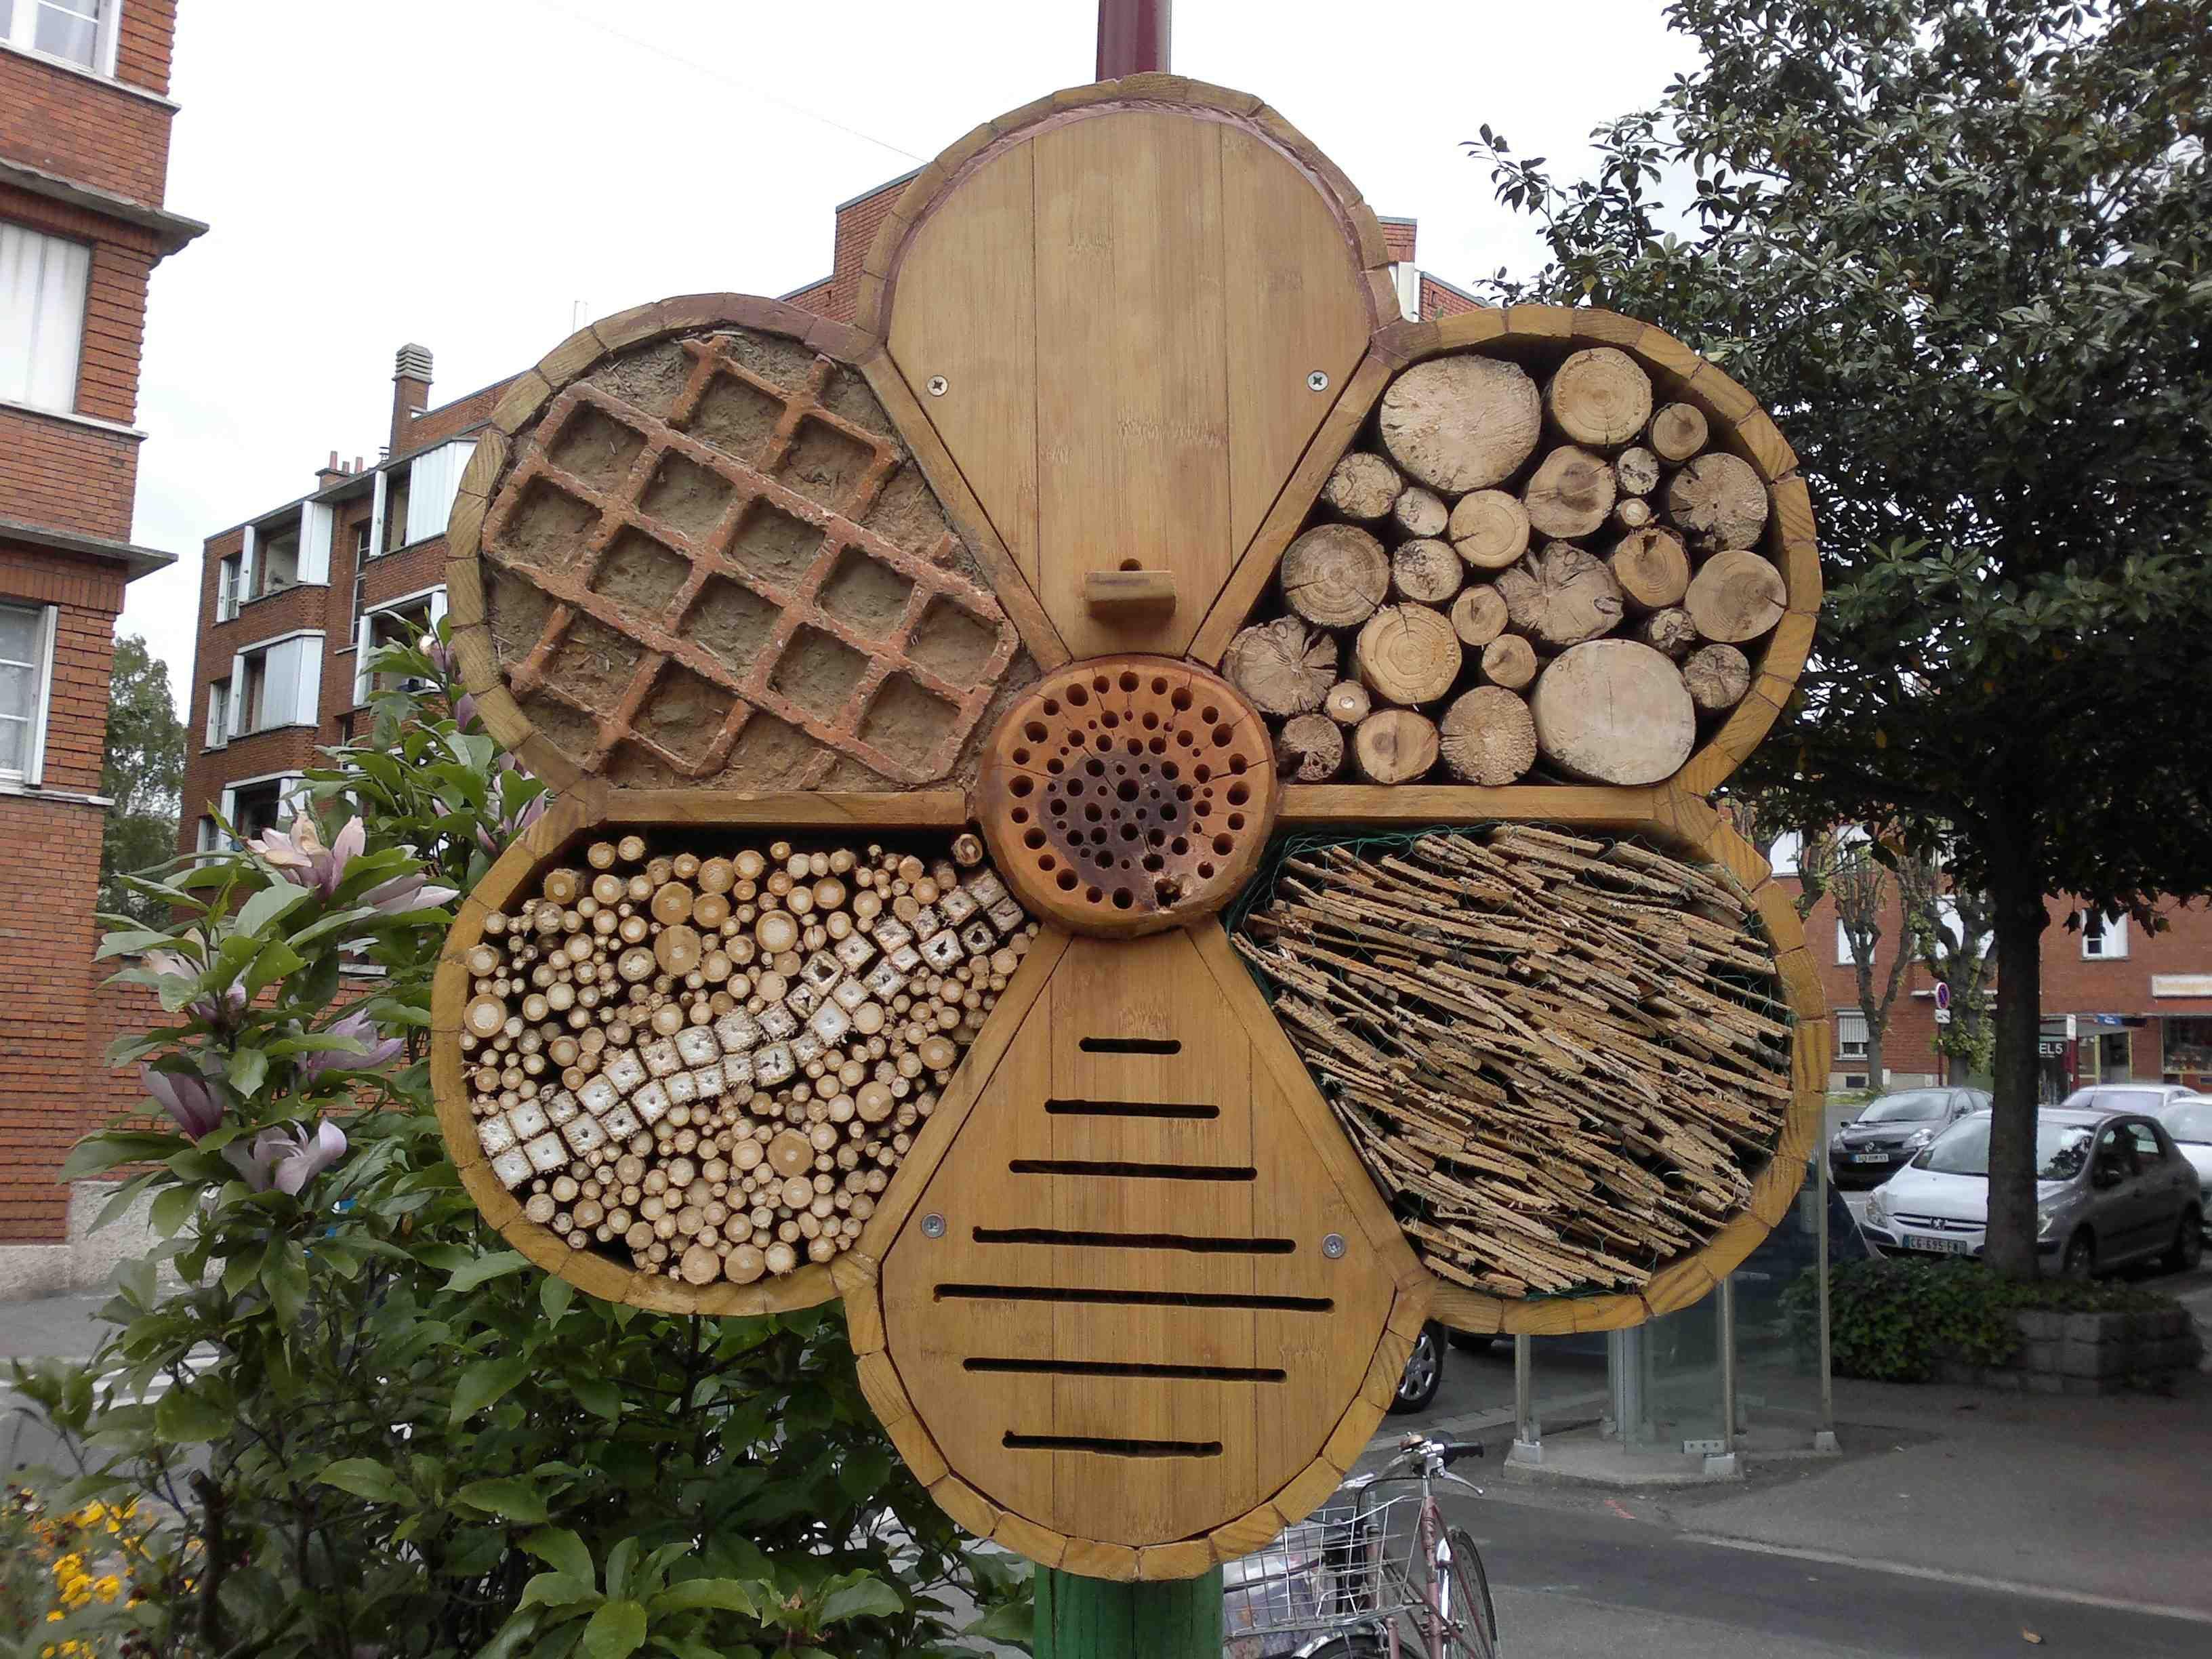 Hotel insectes place s verine jardinons ensemble projets essayer insektenhotel - Maison a insectes plan ...